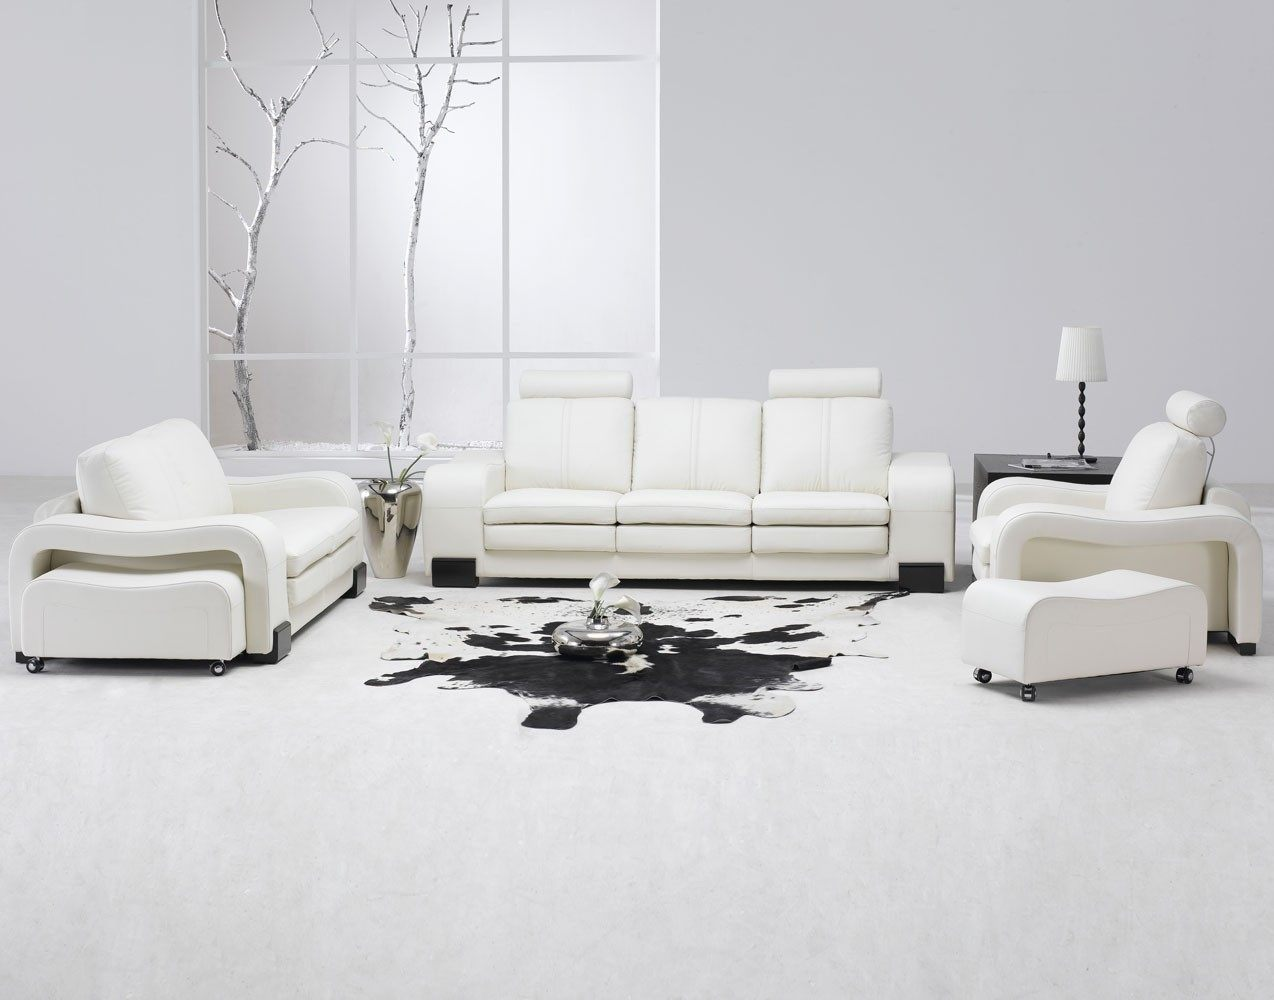 decoracao branca sala : decoracao branca sala:Modern White Living Room